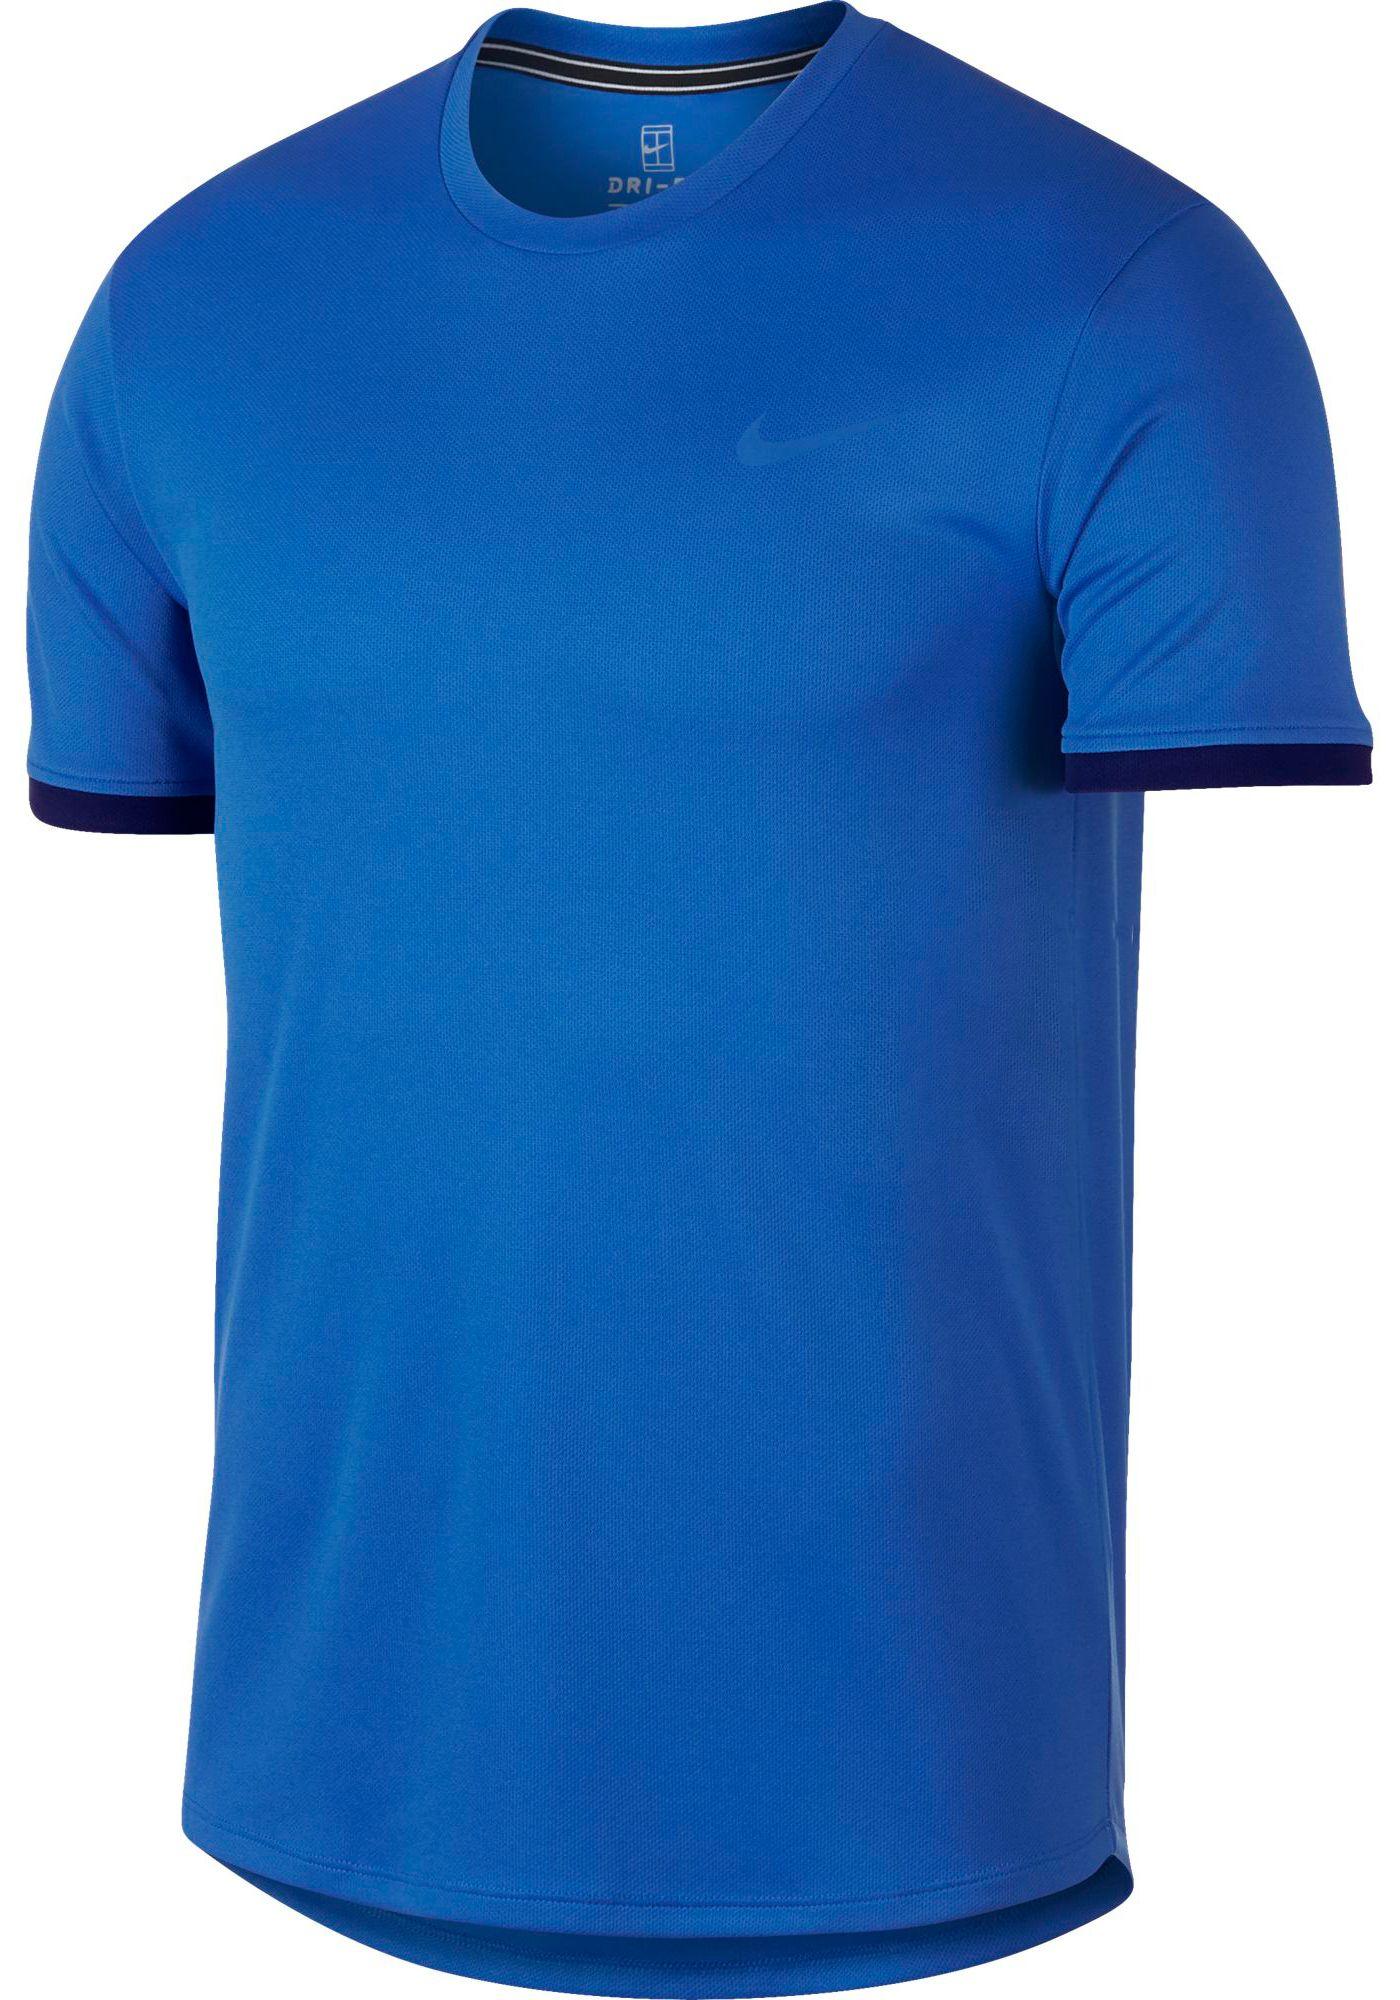 Nike Men's NikeCourt Dri-FIT Tennis Shirt